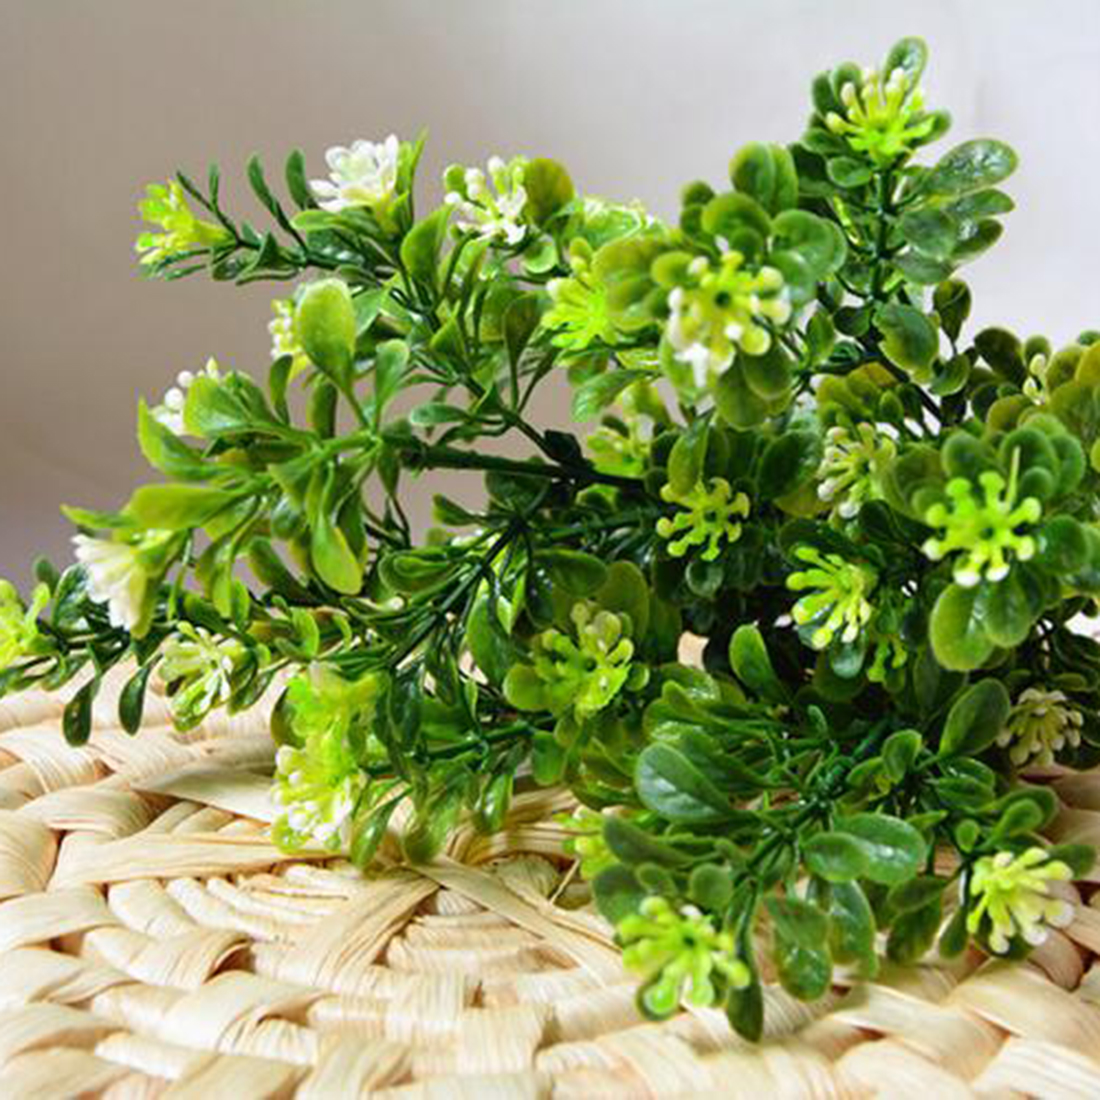 Hot 7 Branch/Bouquet 35 Heads Artificial Green Plant Fake Milan Grass Bonsai Decoration Leaf Corner Lawn Decoration